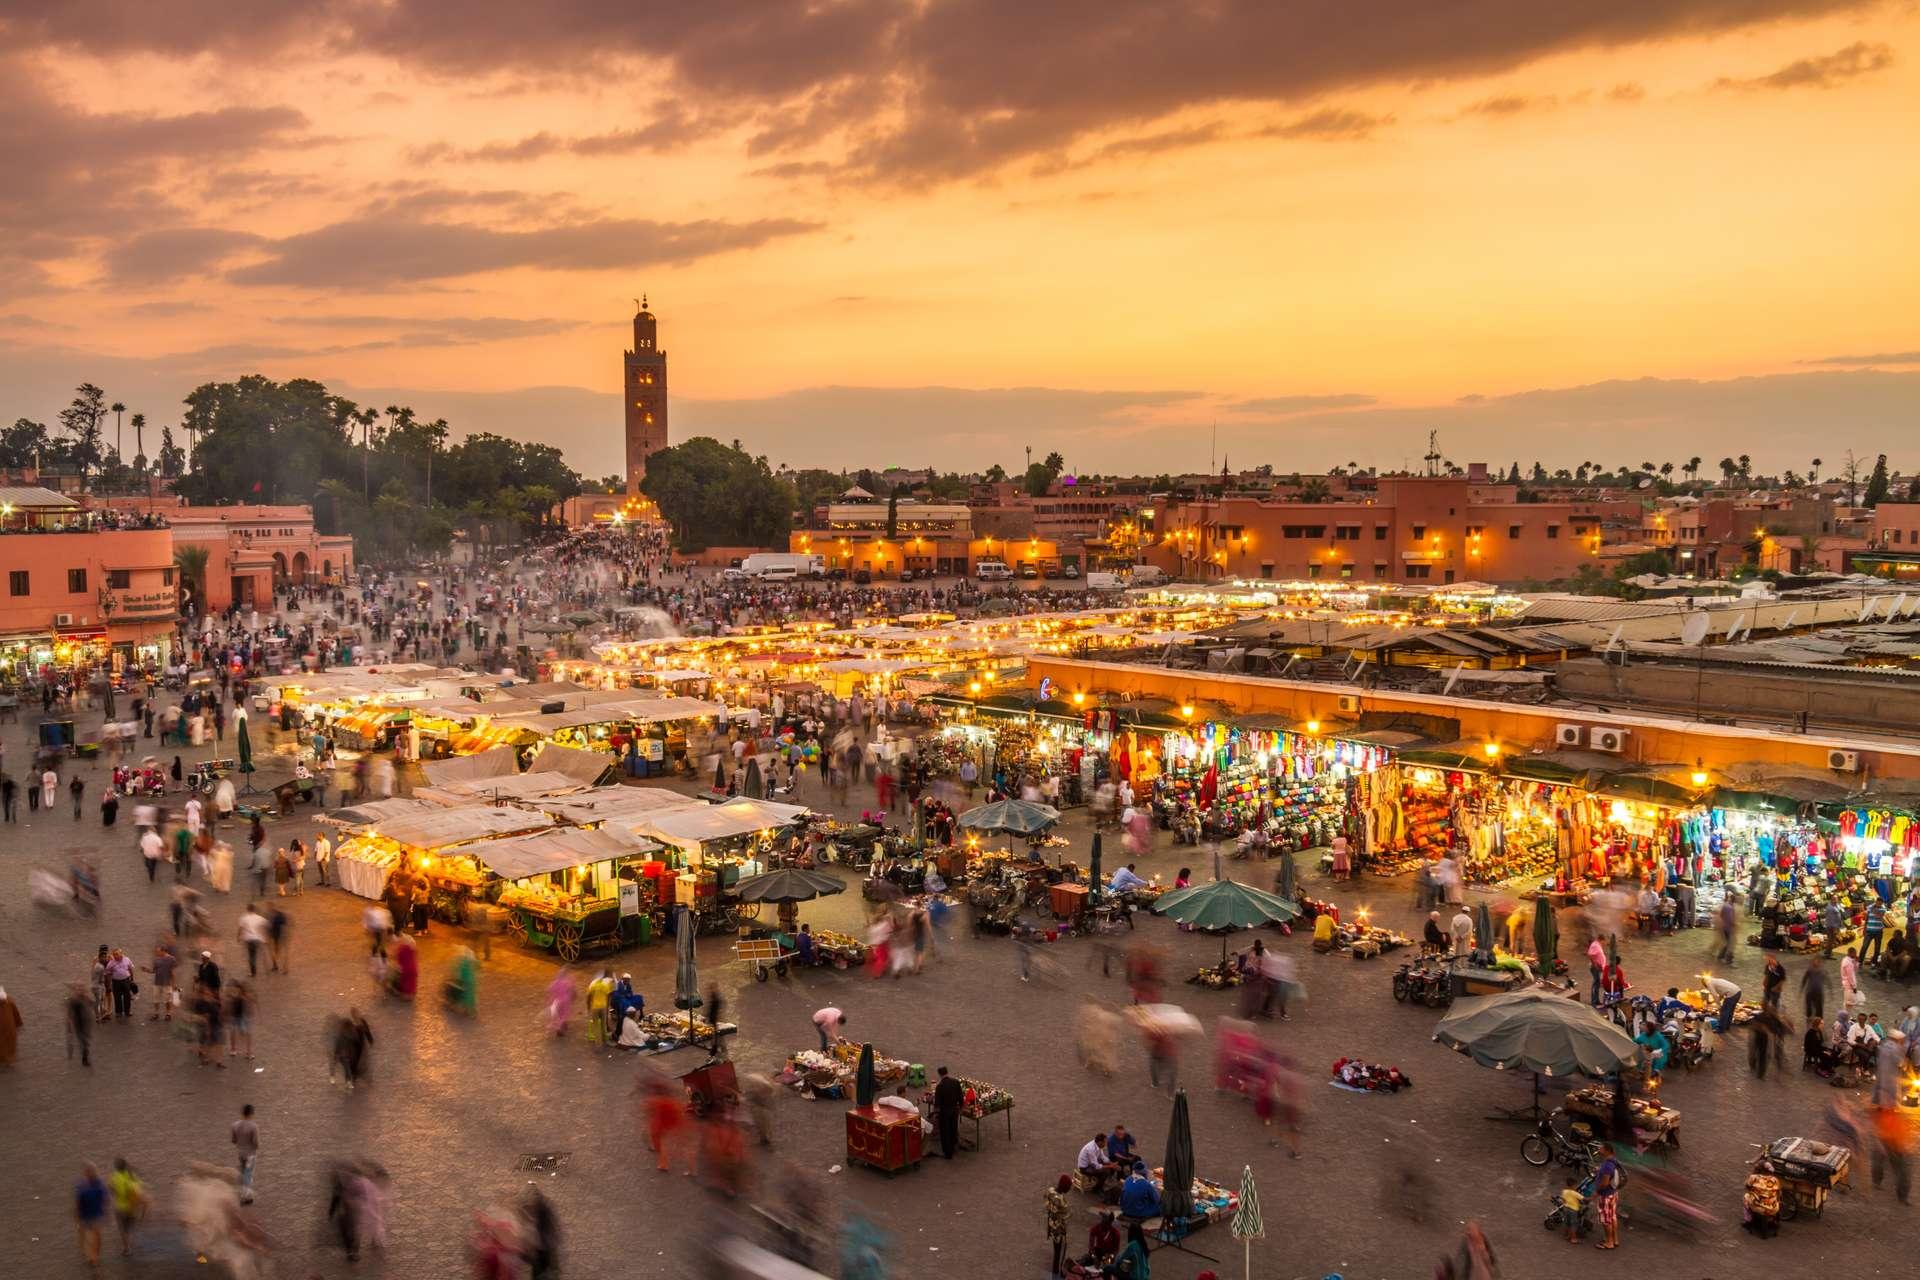 Morokko Marrakech Jamaa el Fna market square